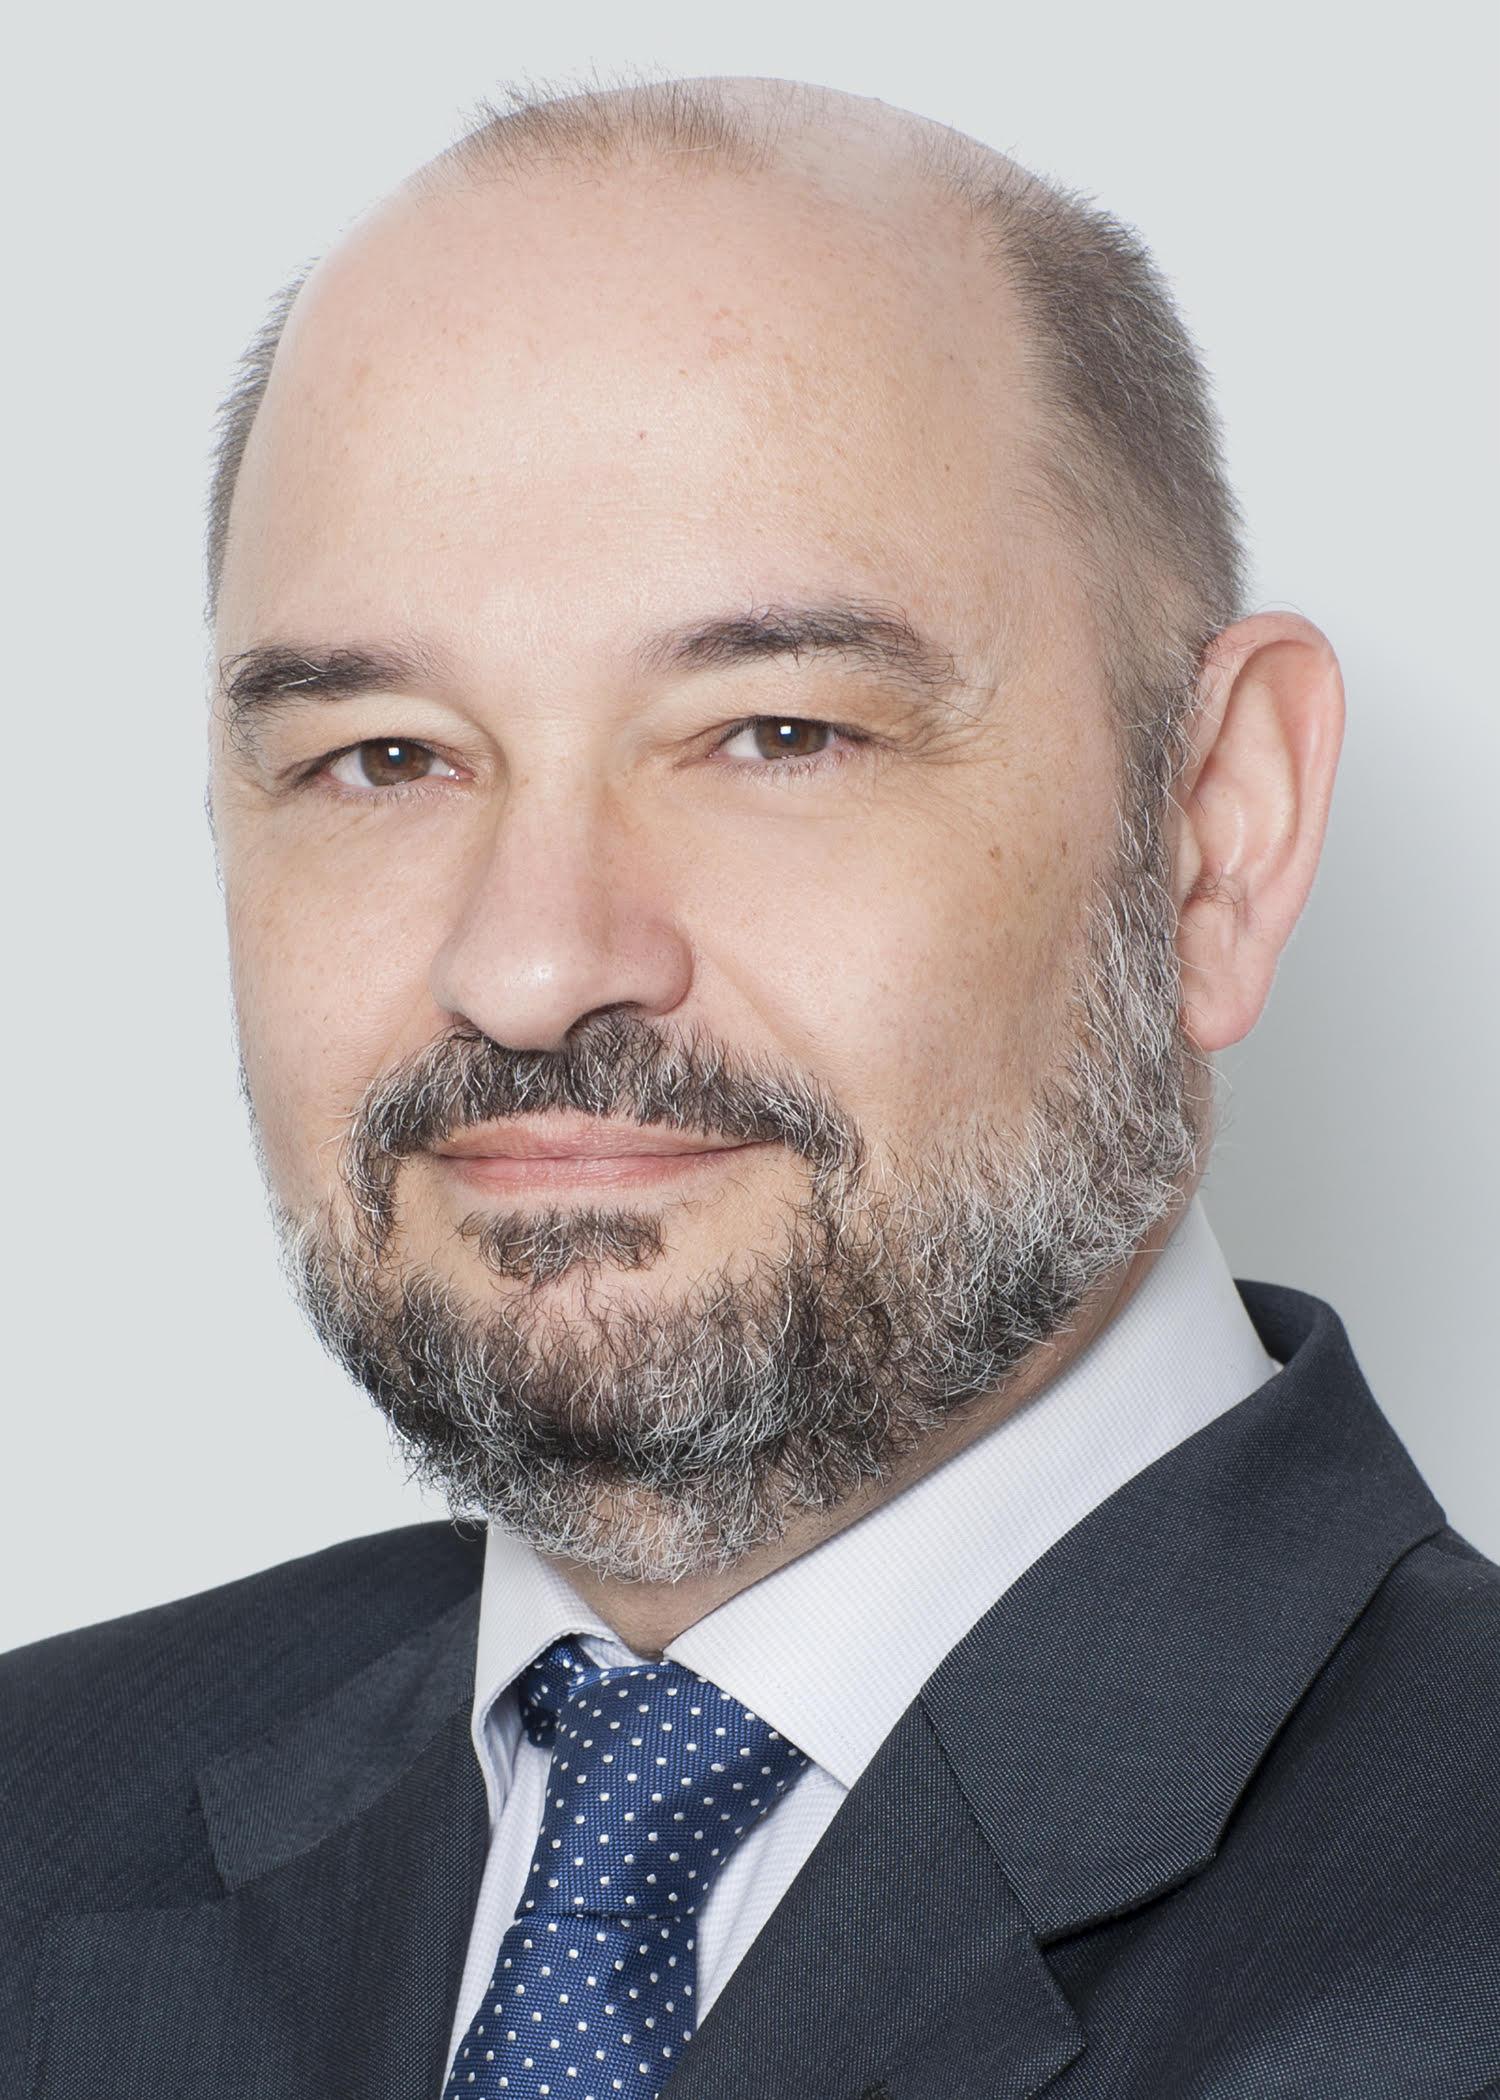 Vicente Estrada